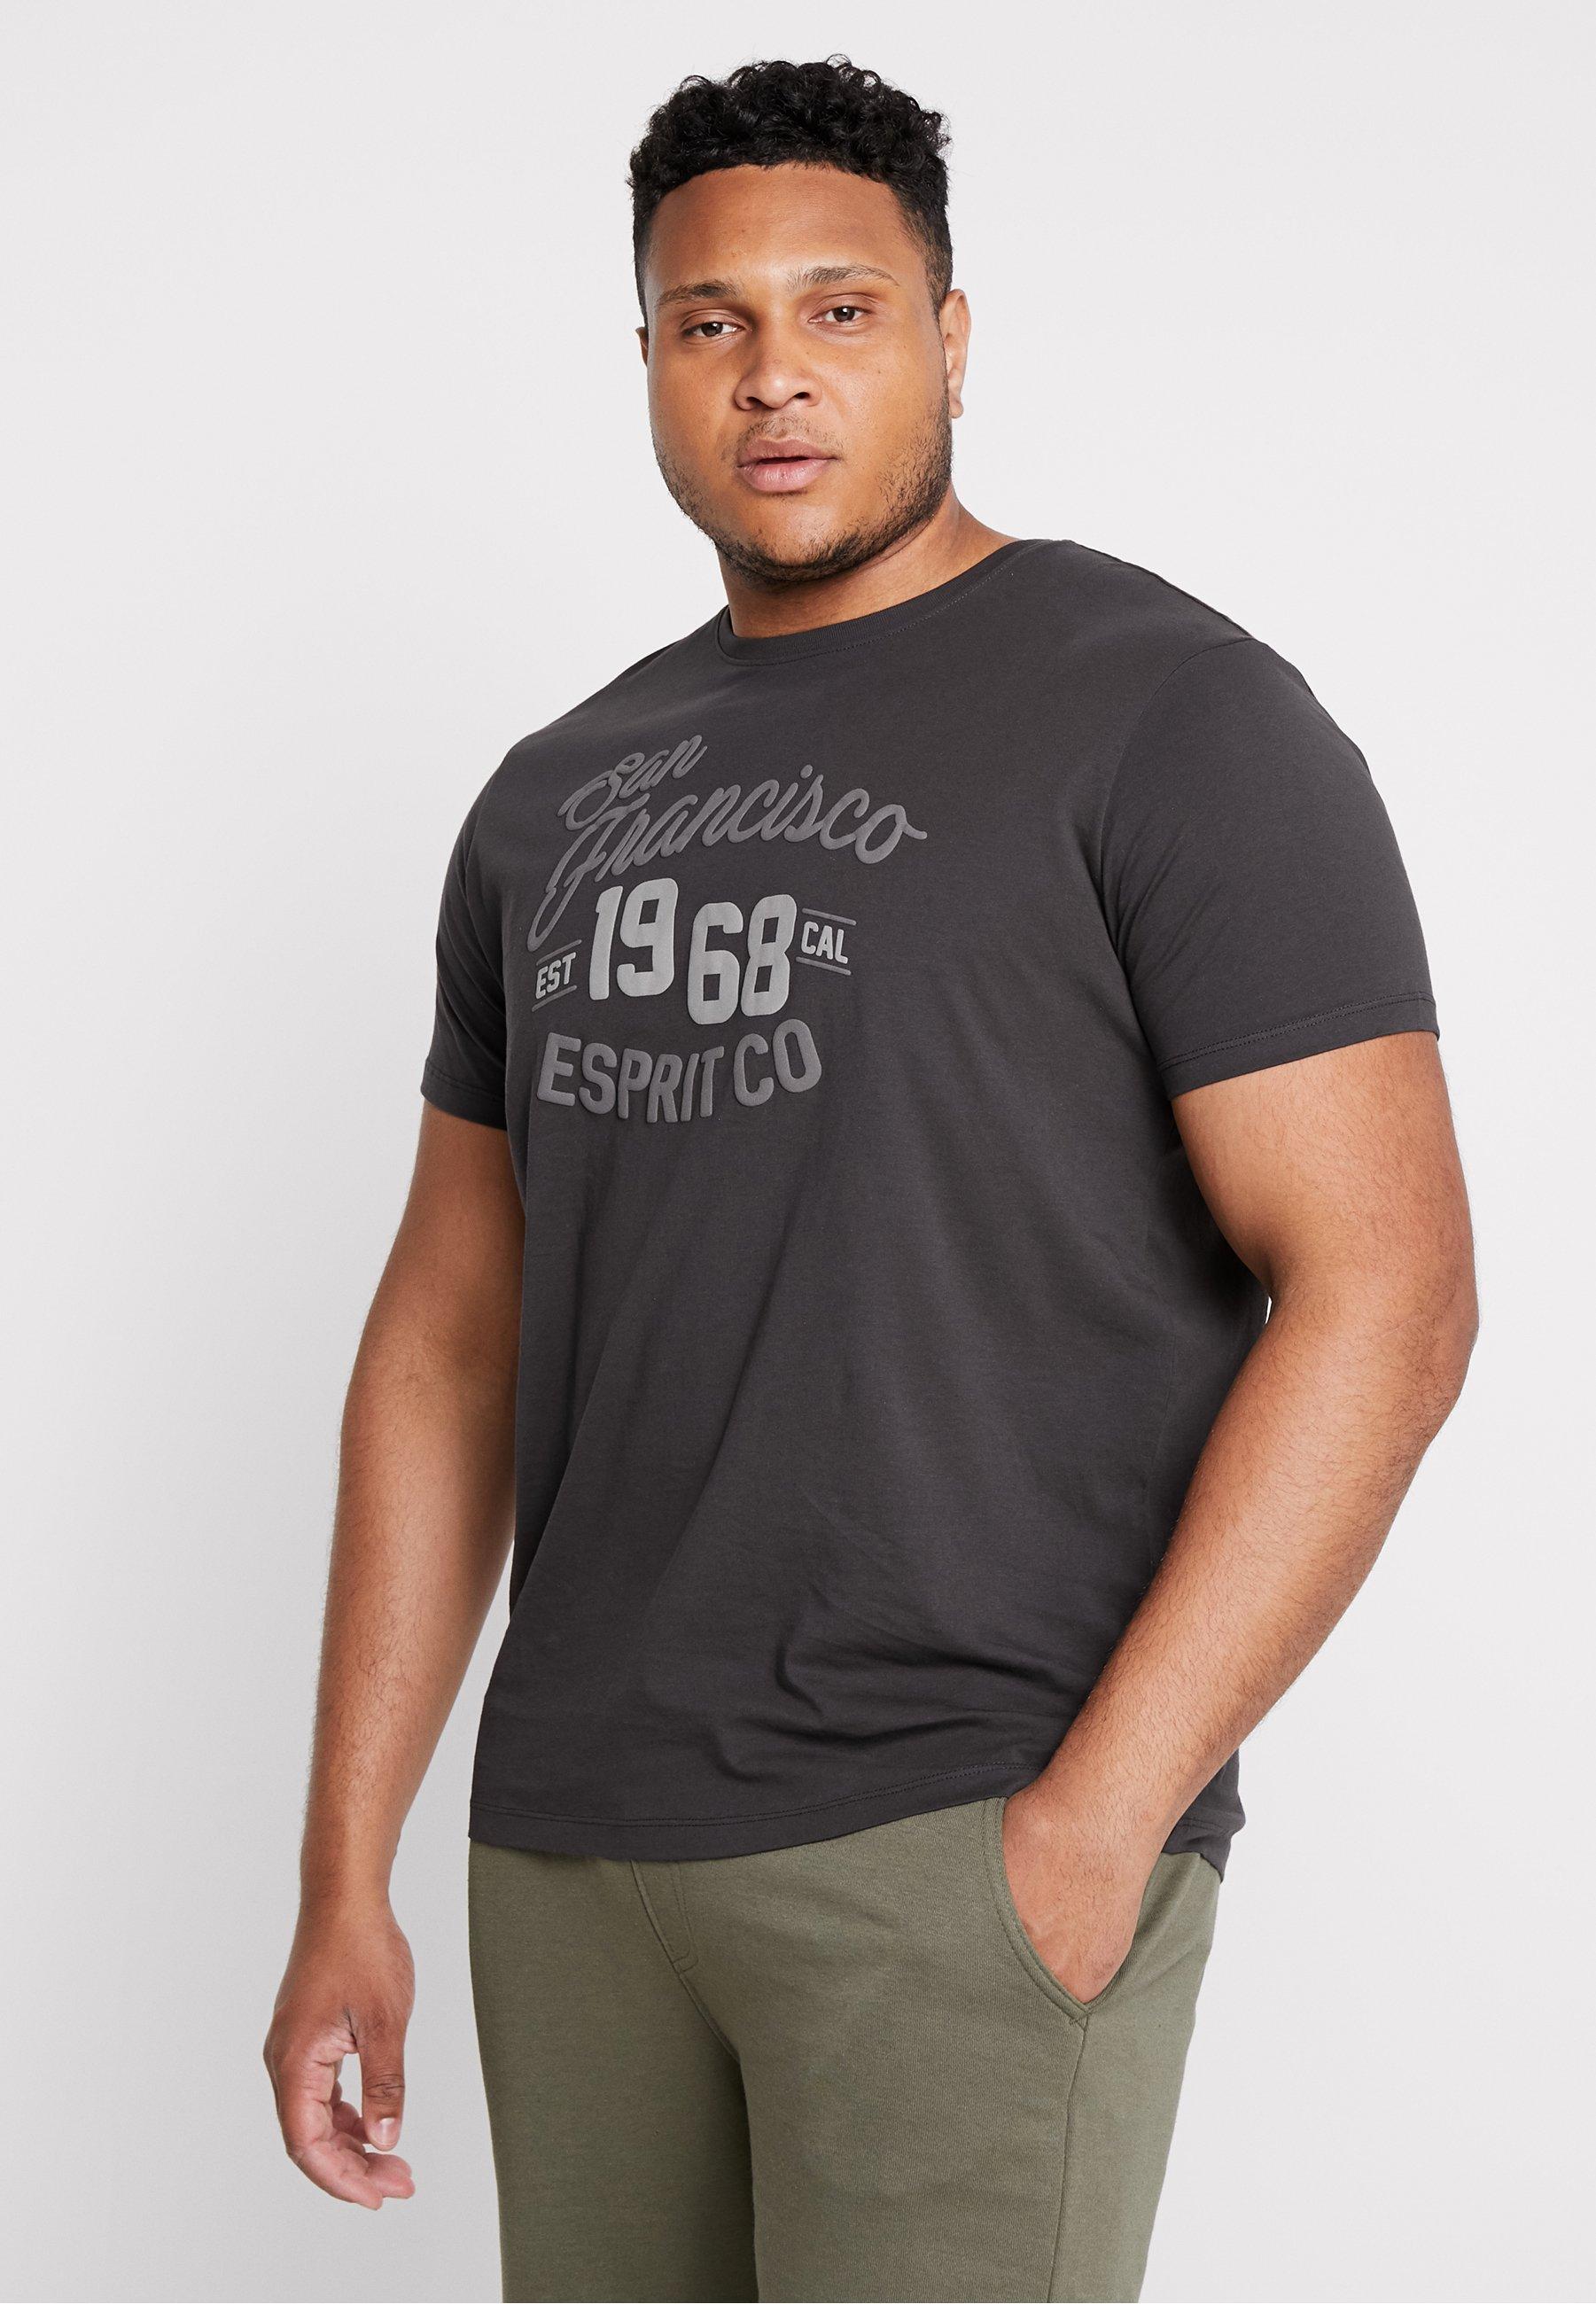 Imprimé Esprit Anthracite shirt BigT Esprit Anthracite BigT Imprimé shirt nwOZN0PX8k